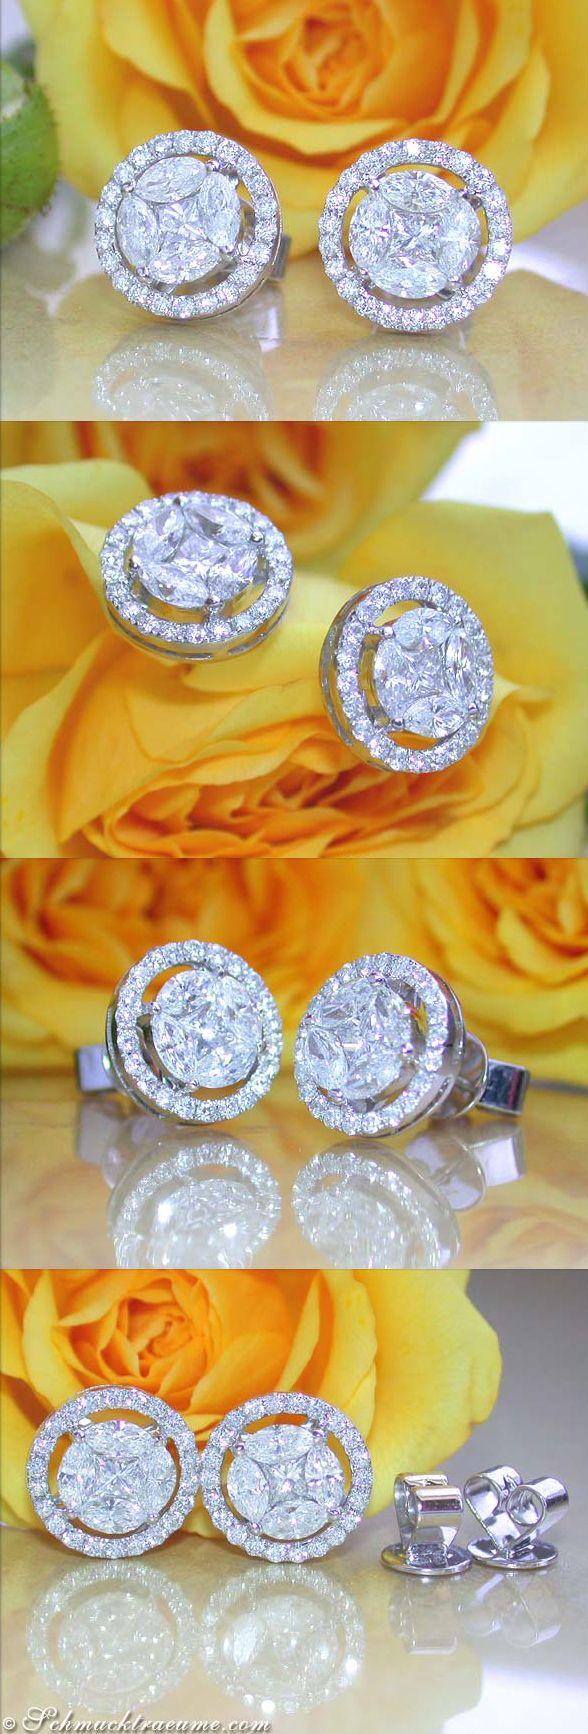 Beautiful Diamond Earrings, 1,34 ct. G-SI/VS WG18K - Visit: schmucktraeume.com - Like: https://www.facebook.com/pages/Noble-Juwelen/150871984924926 - Mail: info@schmucktraeume.com